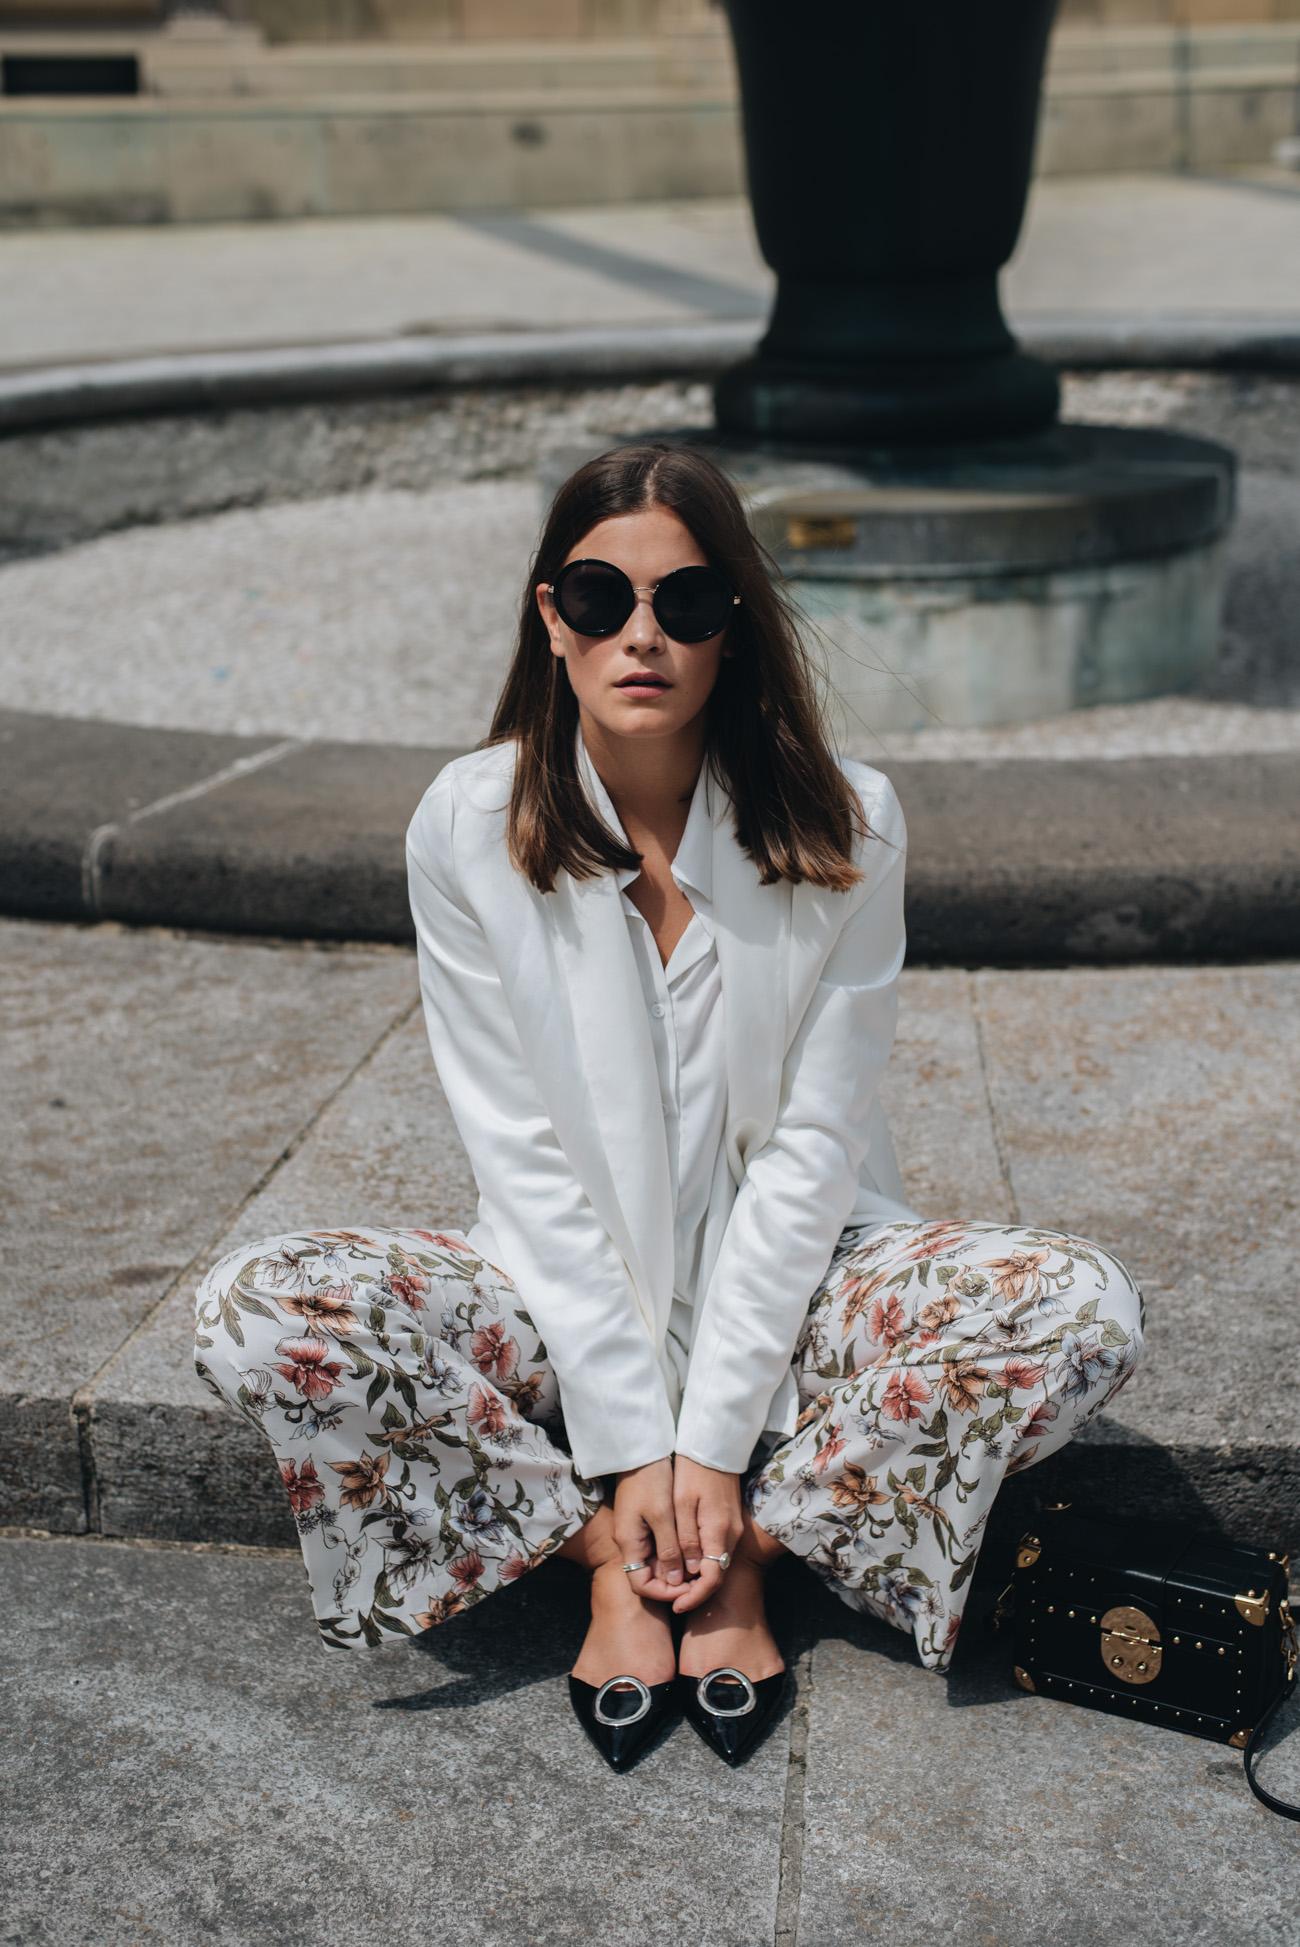 nina-schwichtenberg-mode-bloggerin-sommer-outfit-blazer-und-blumen-hose-nina-schwichtenberg-fashiioncarpet